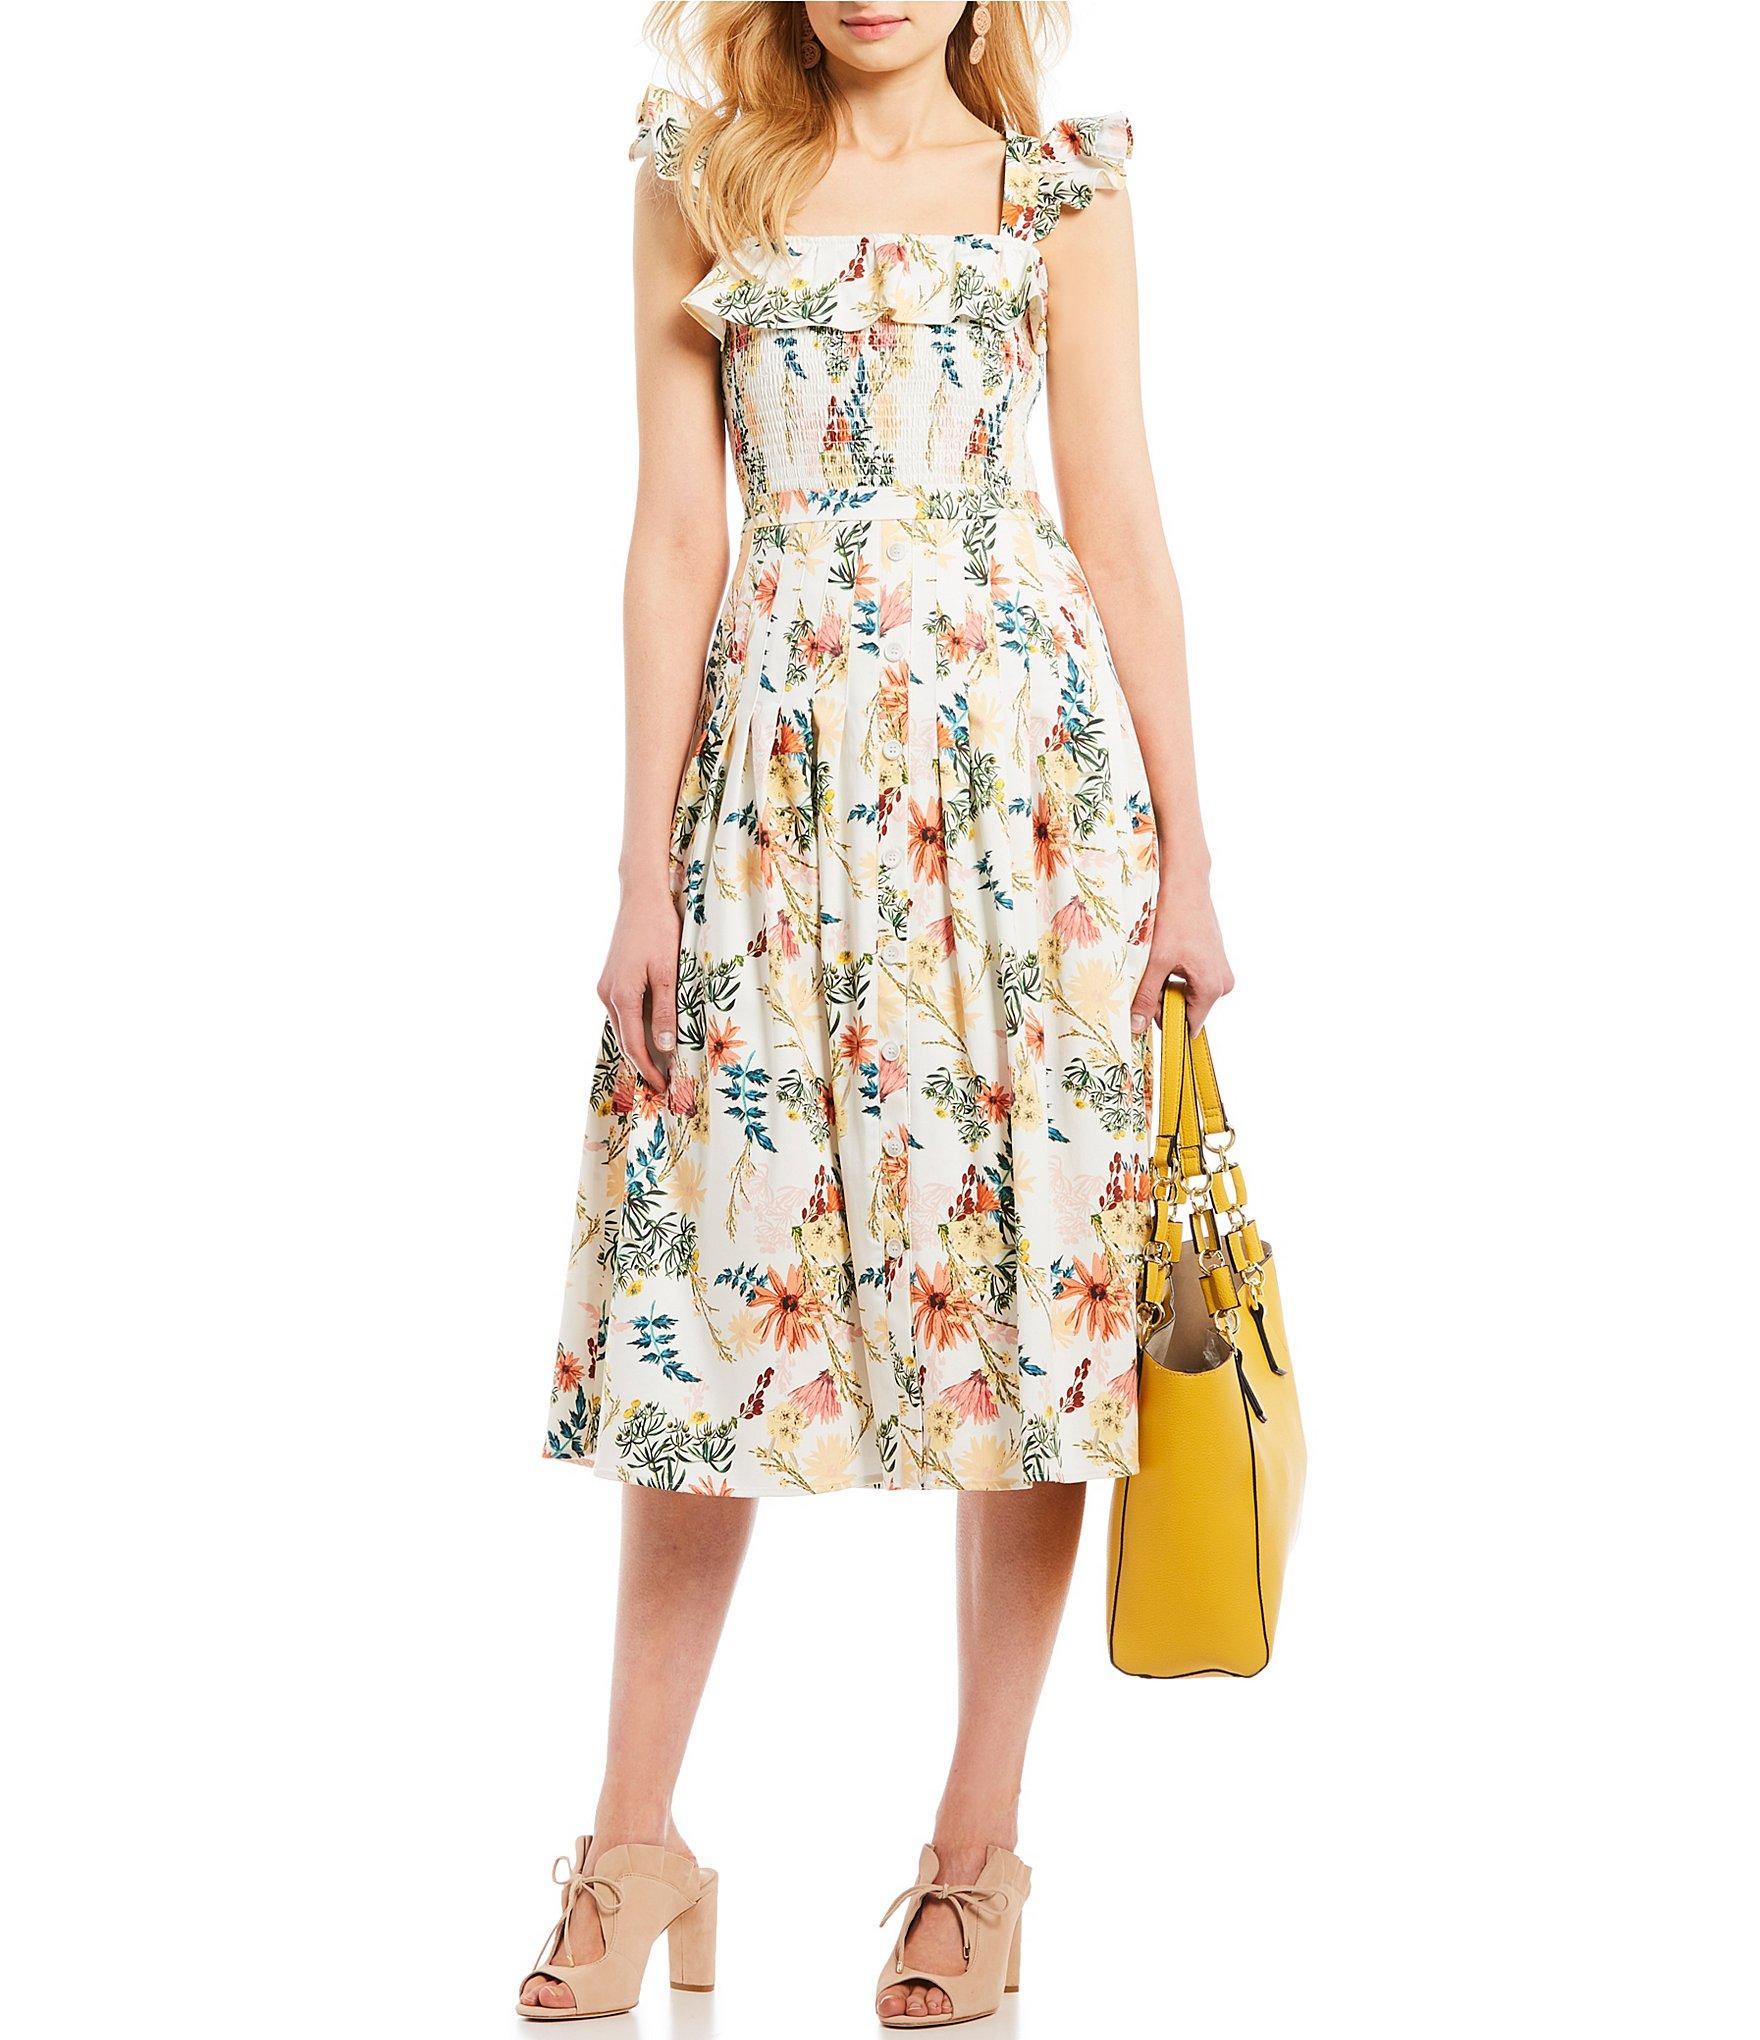 f4982f5b4a3 Antonio Melani. Women s Lila Floral Print Smocked Ruffle Bodice A-line Midi  Dress